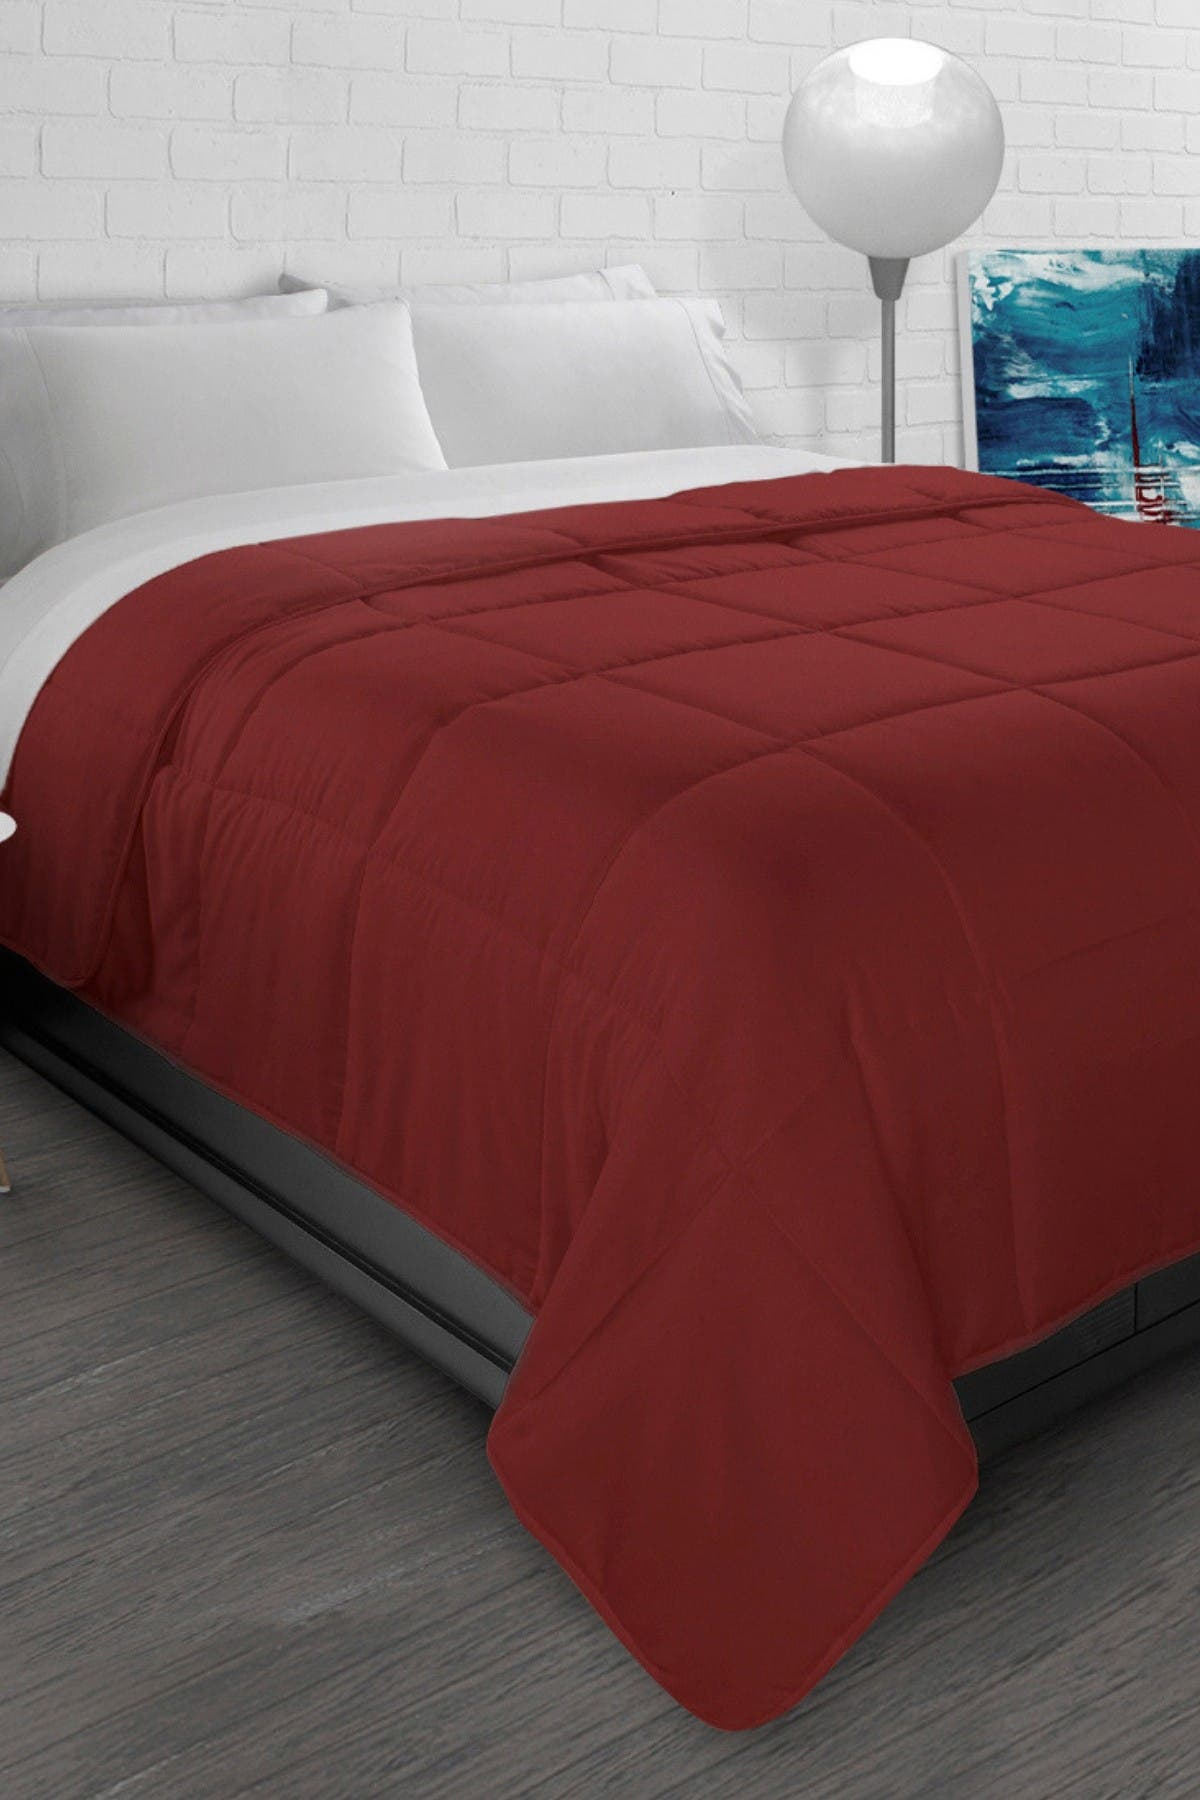 Image of Ella Jayne All-Season Super Soft Triple Brushed Microfiber Down-Alternative Comforter - Brick Red